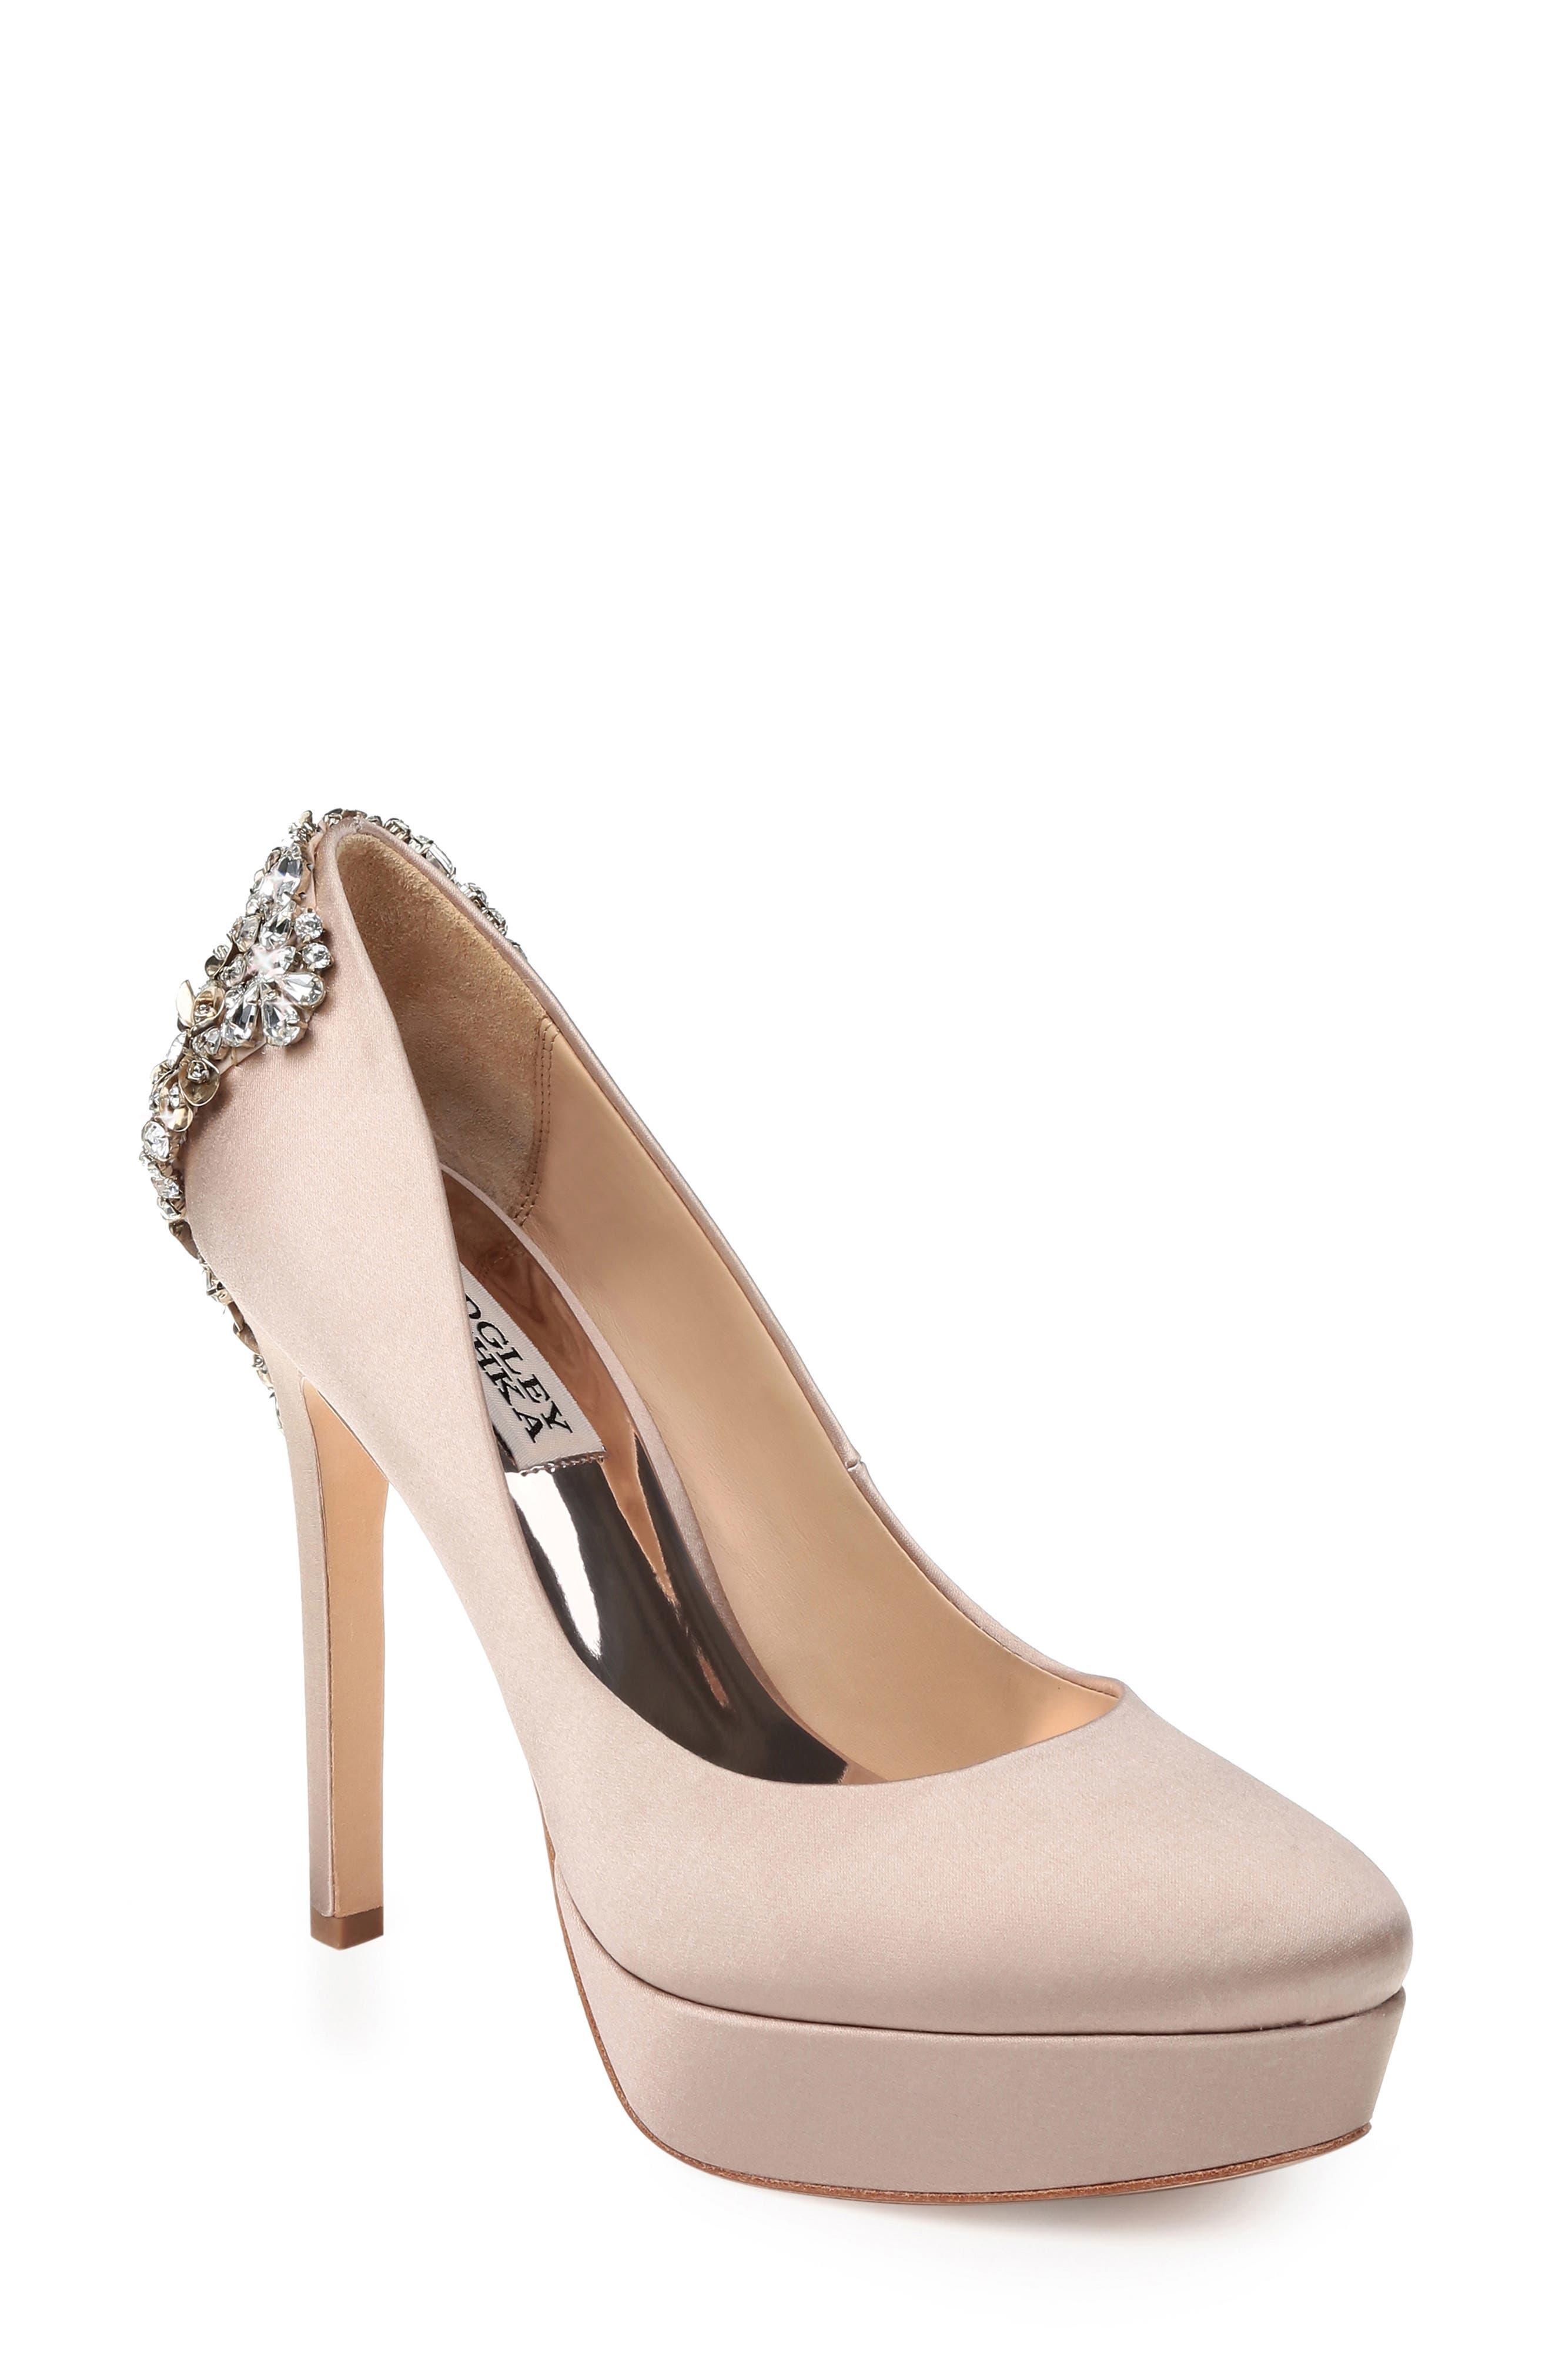 Women'S Viola Almond Toe Embellished Satin Platform High-Heel Pumps in Latte Satin